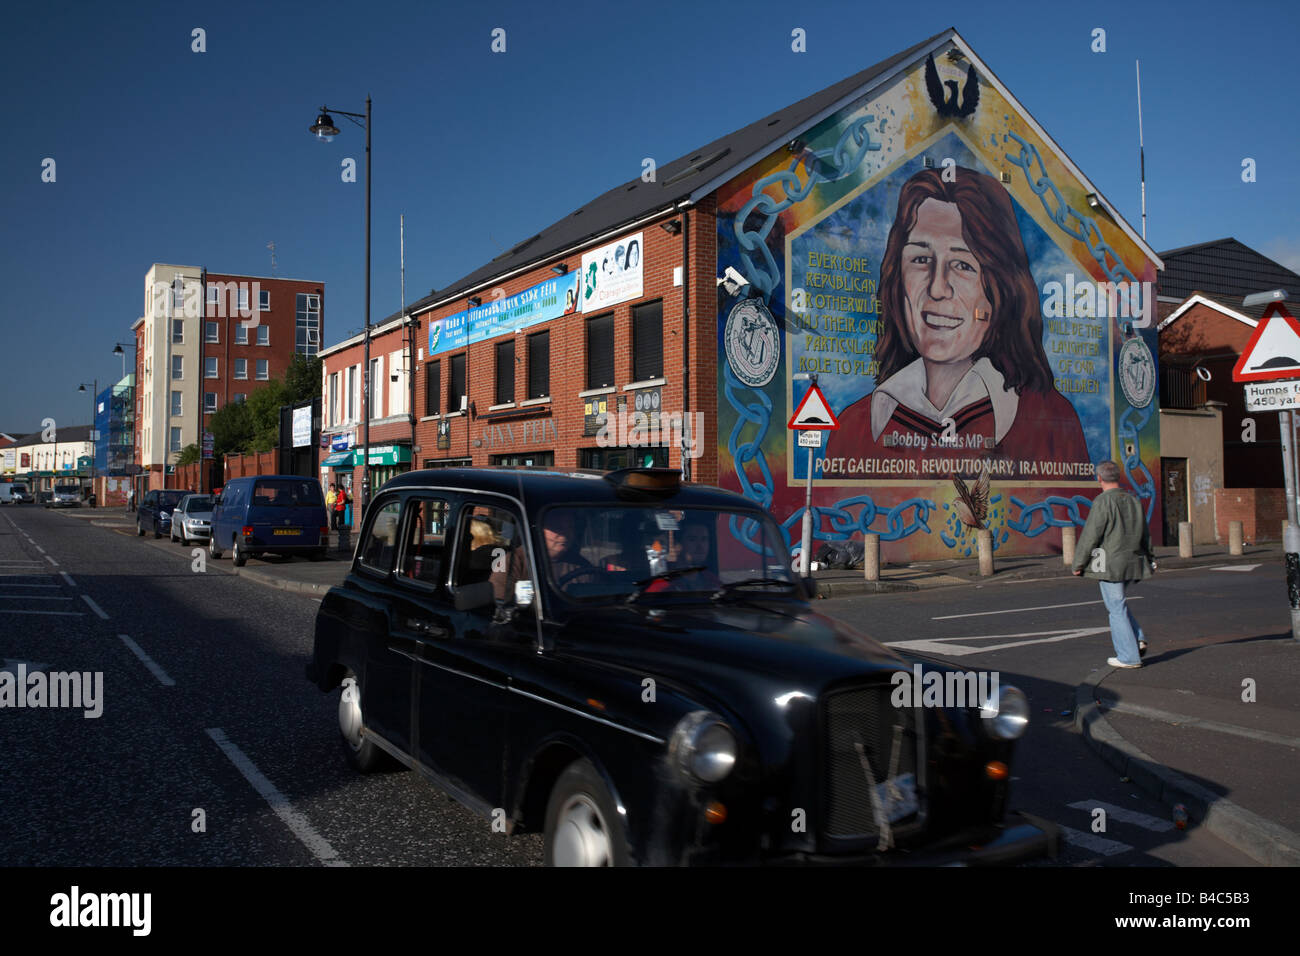 Sinn Féin Büro und Bobby Sands Wandbild fällt weg Belfast City centre Nordirland Vereinigtes Königreich Stockbild